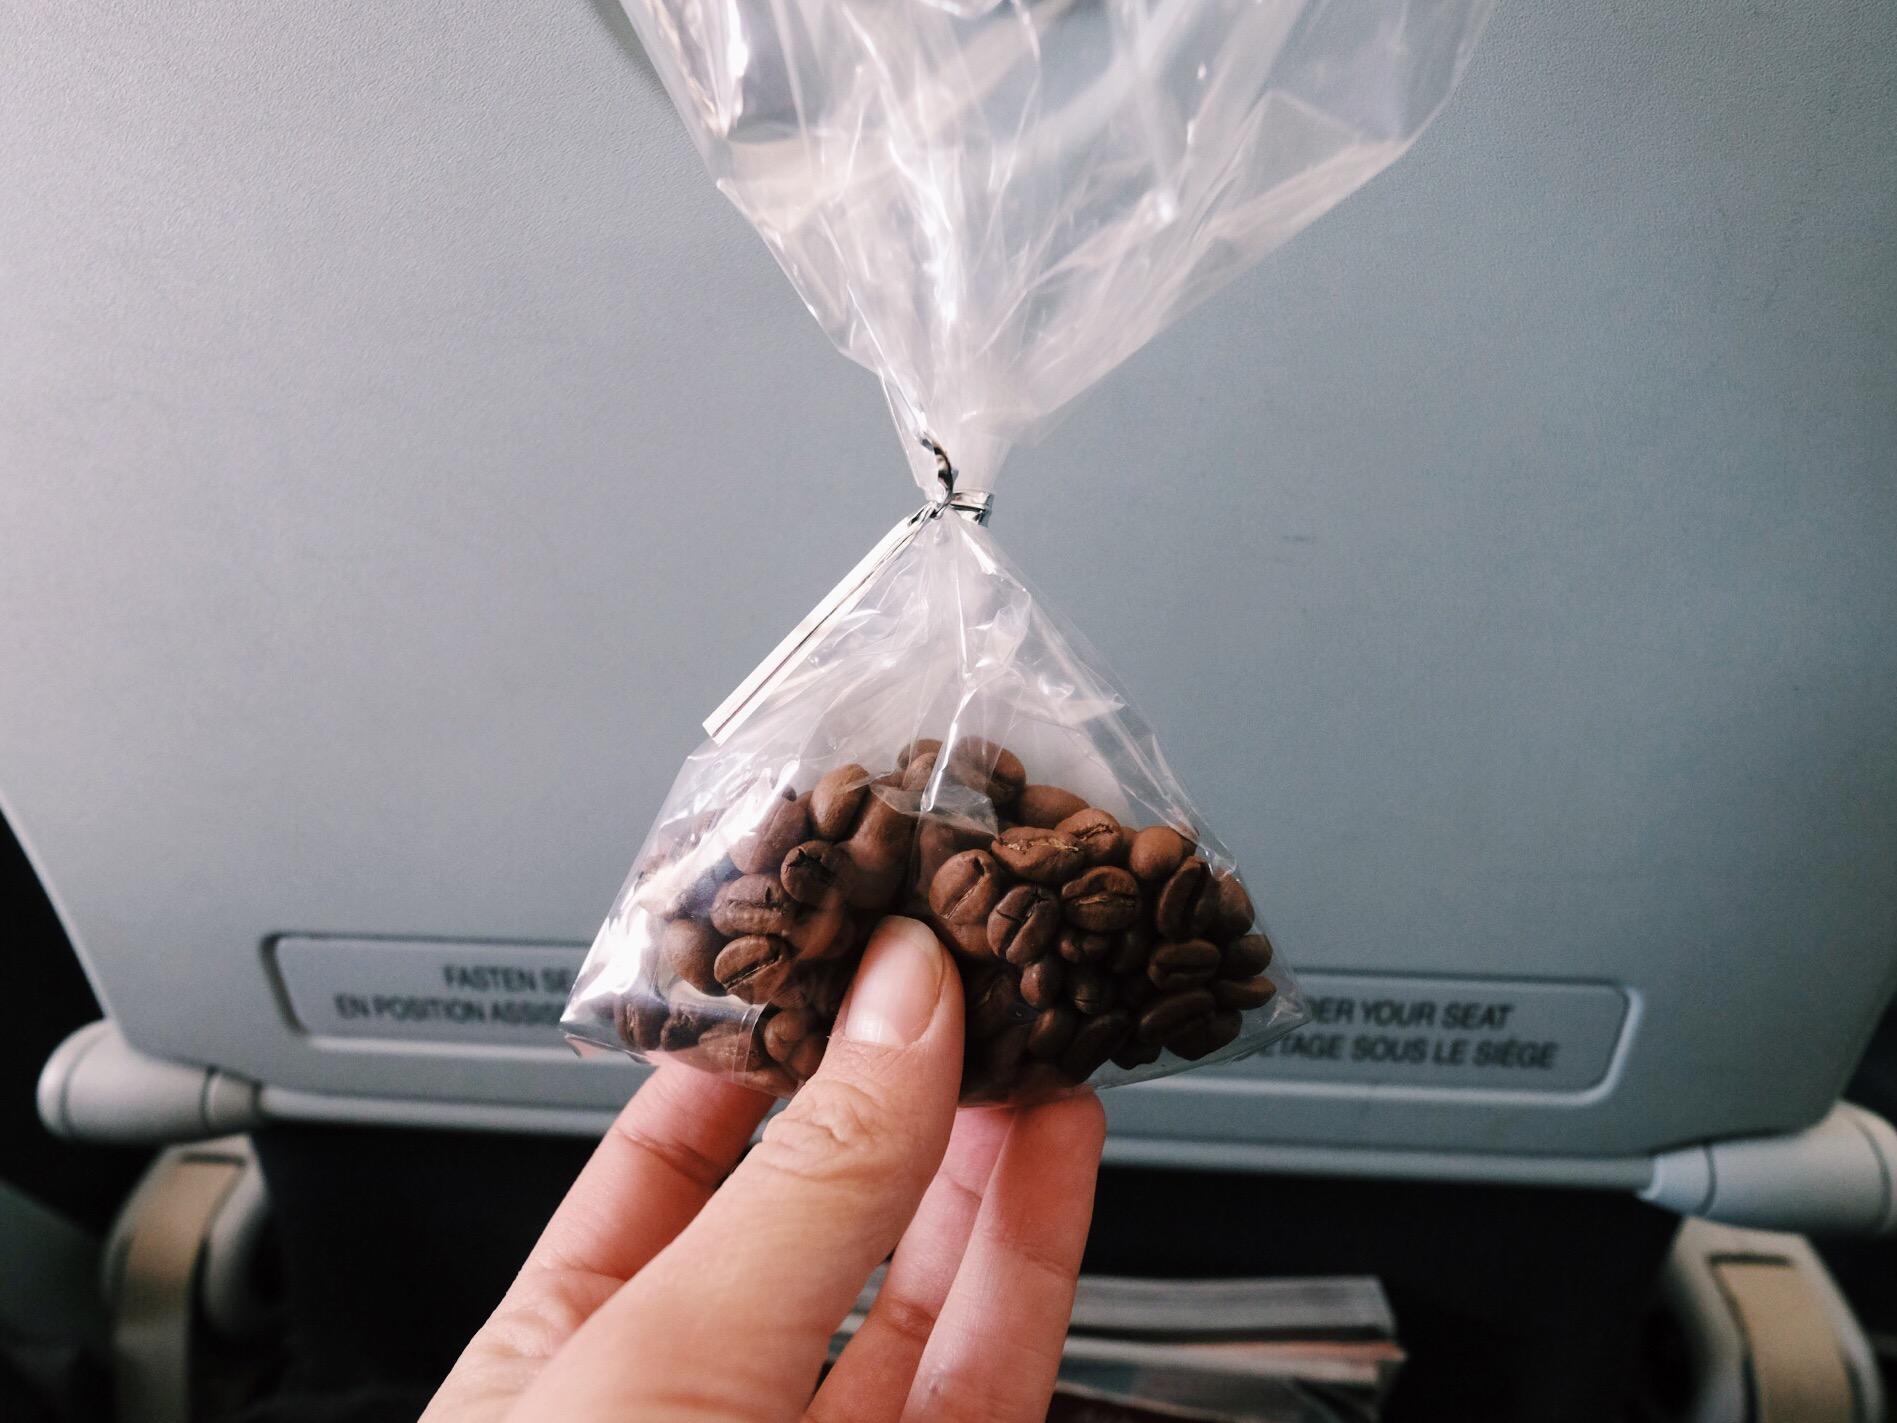 15g of coffee